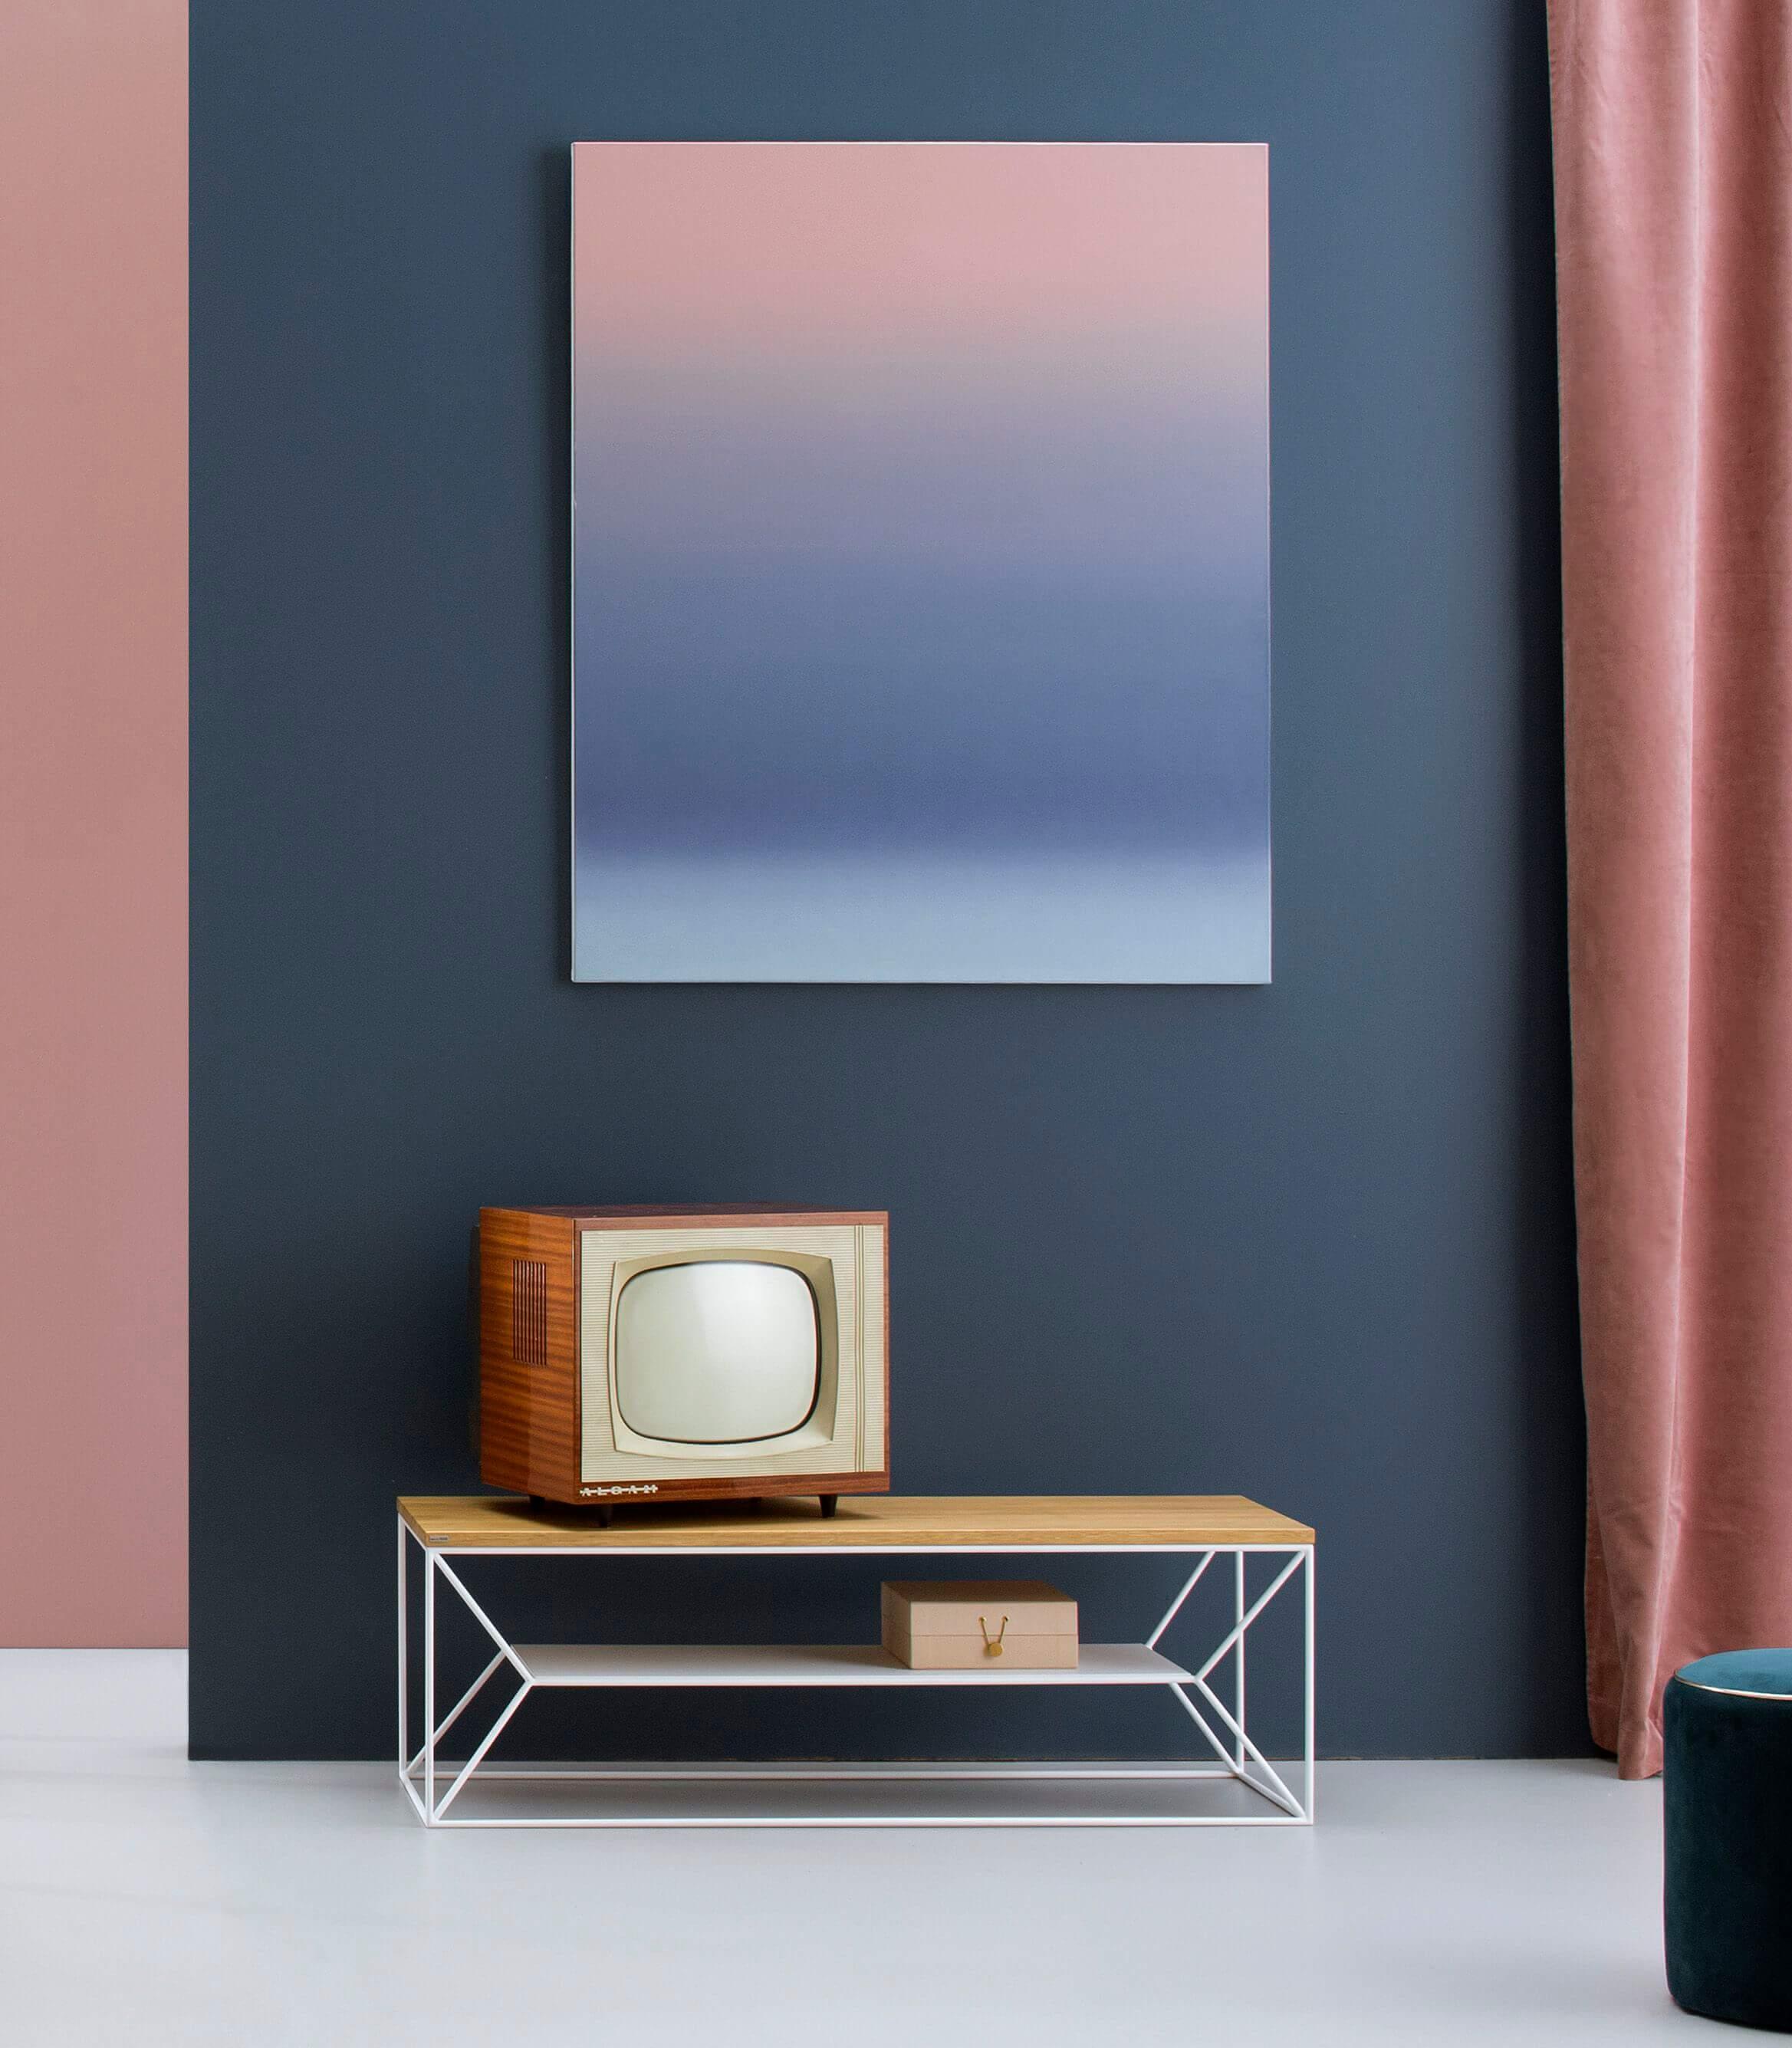 minimalistyczny stolik rtv maximo - take me HOME